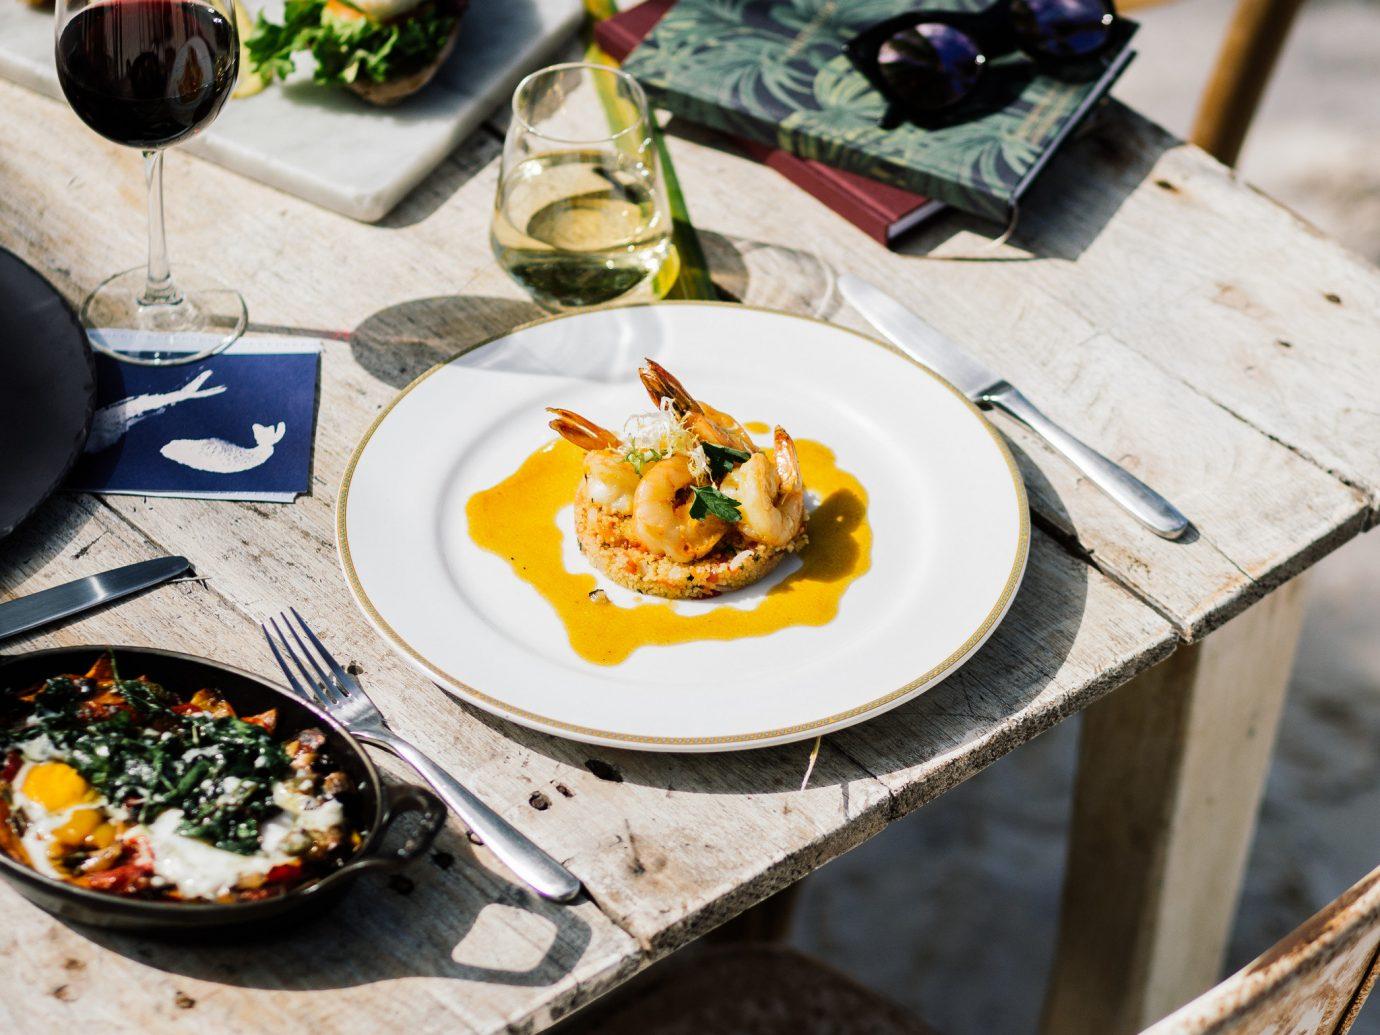 Beach Honeymoon Hotels Mexico Romance Tulum table plate ground food dish meal cuisine breakfast